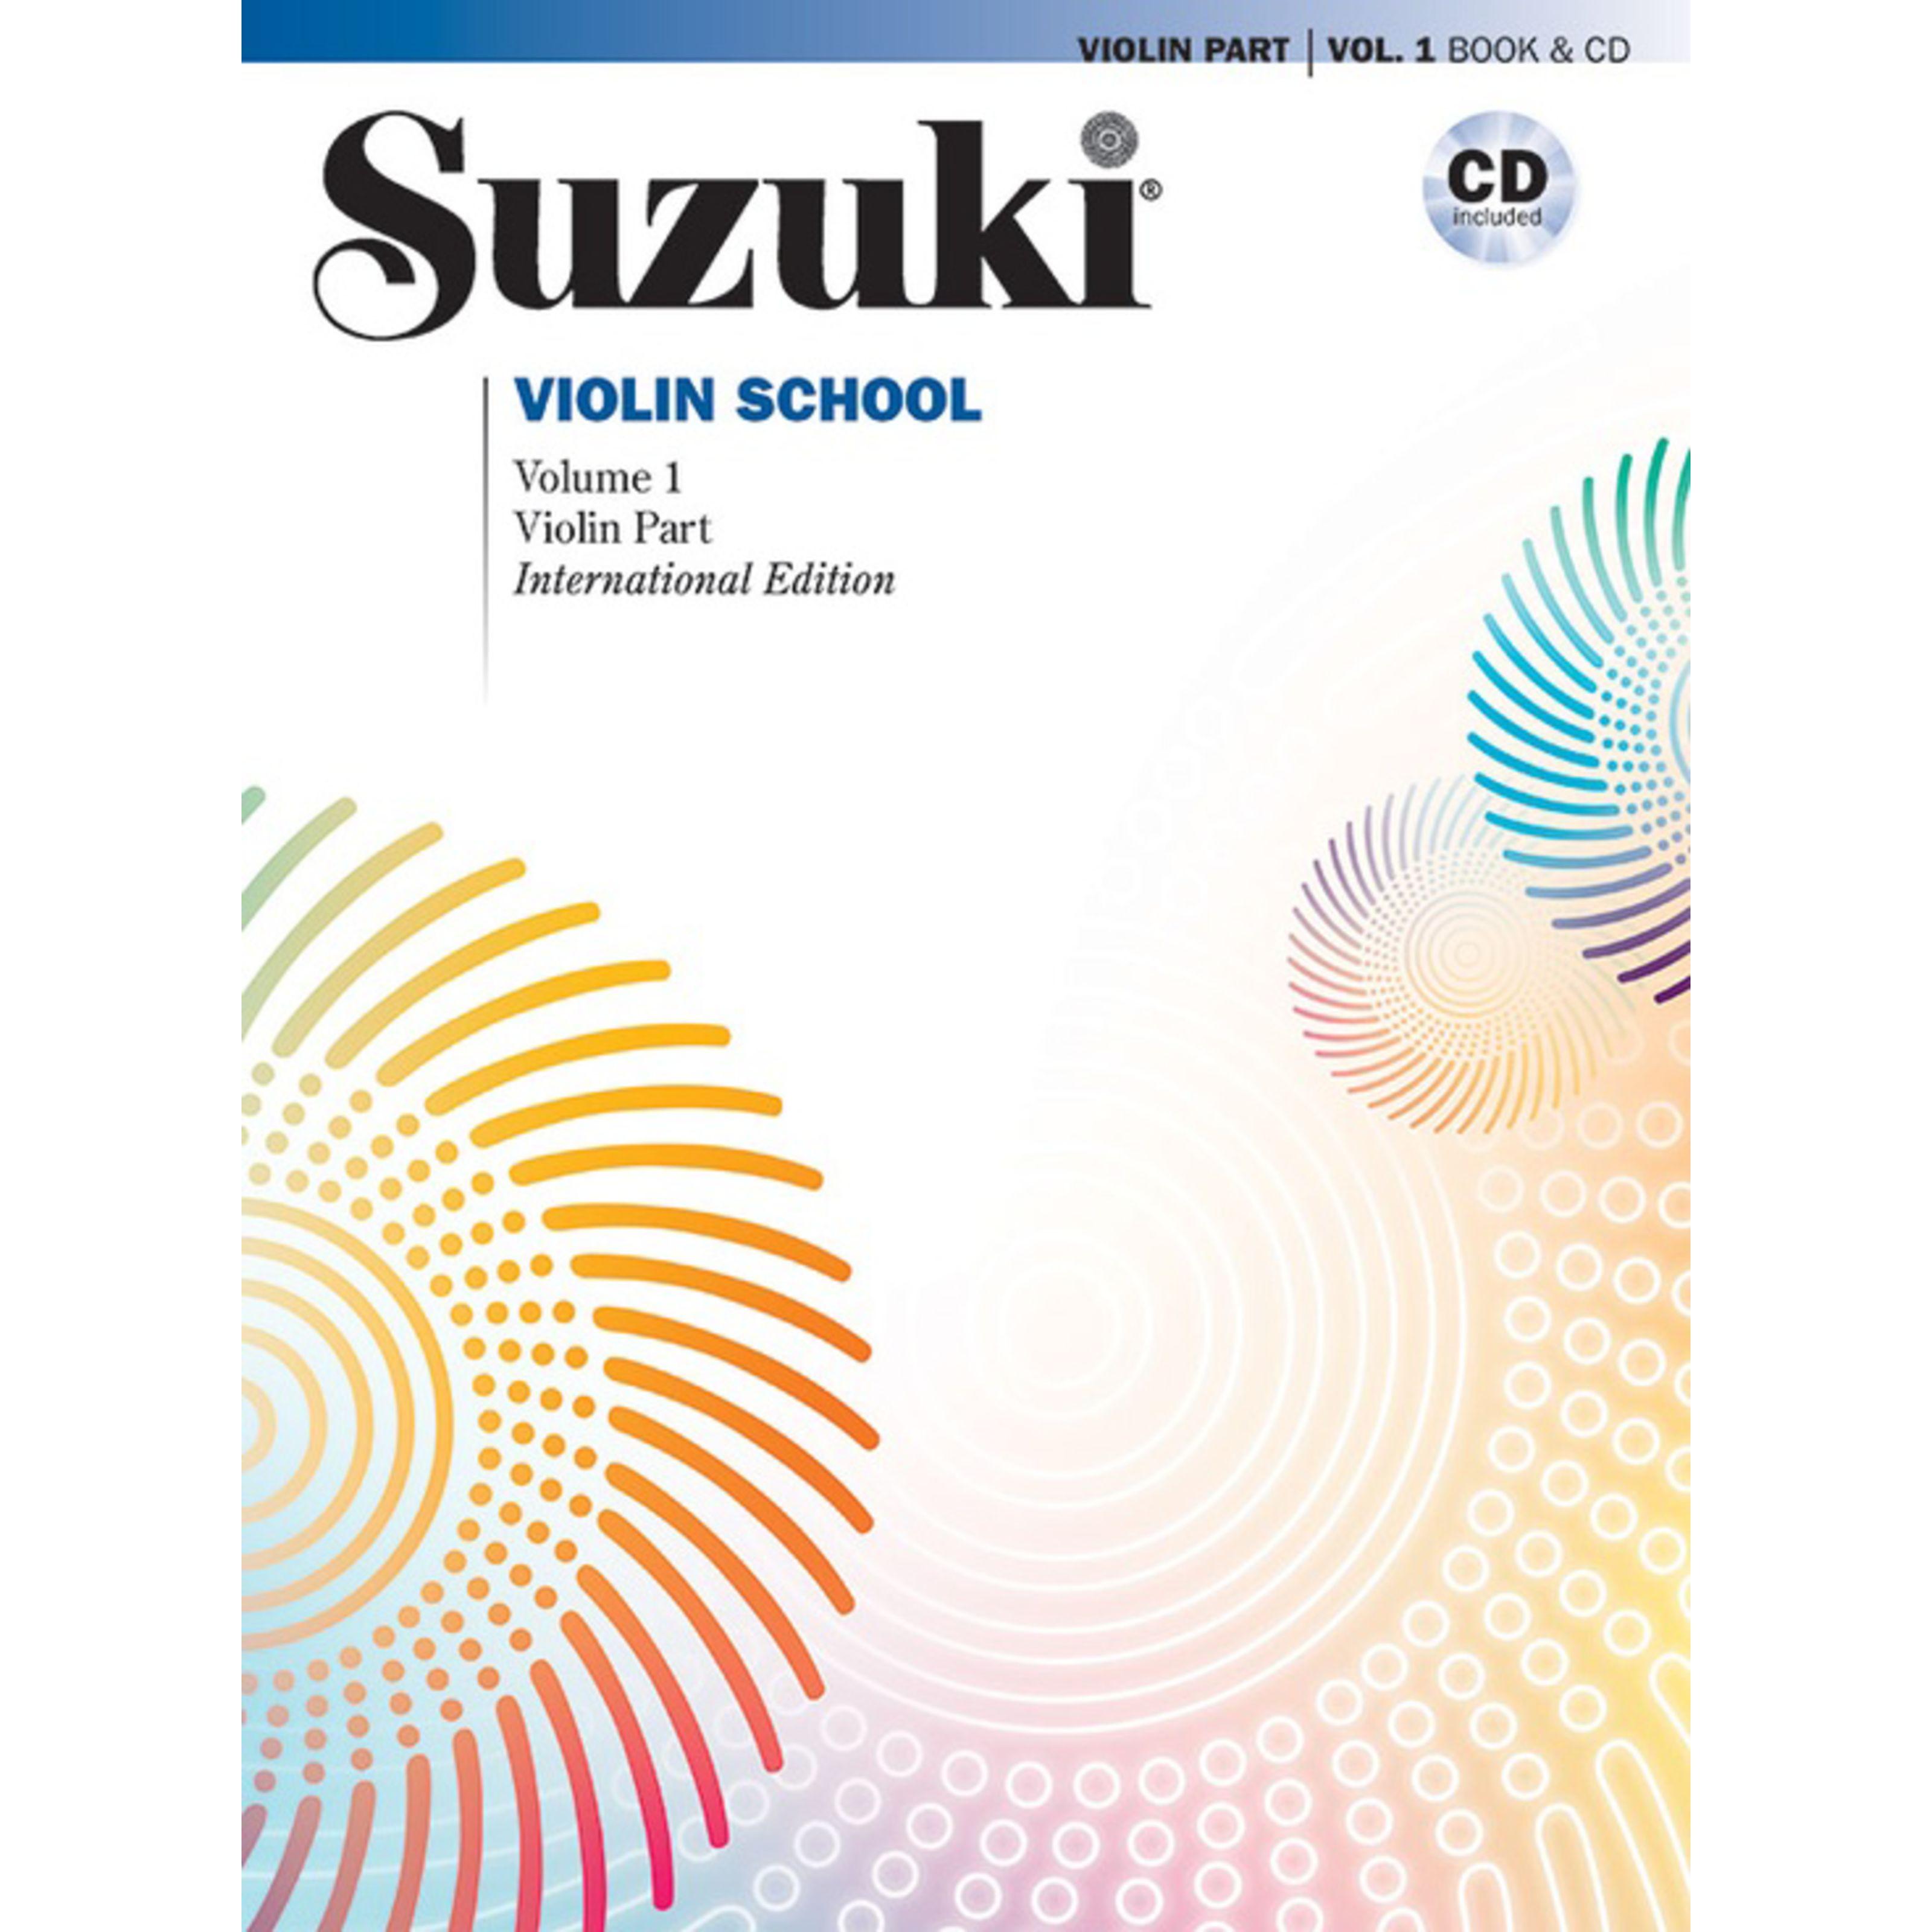 Alfred Music - Suzuki Violin School 1 00-48722